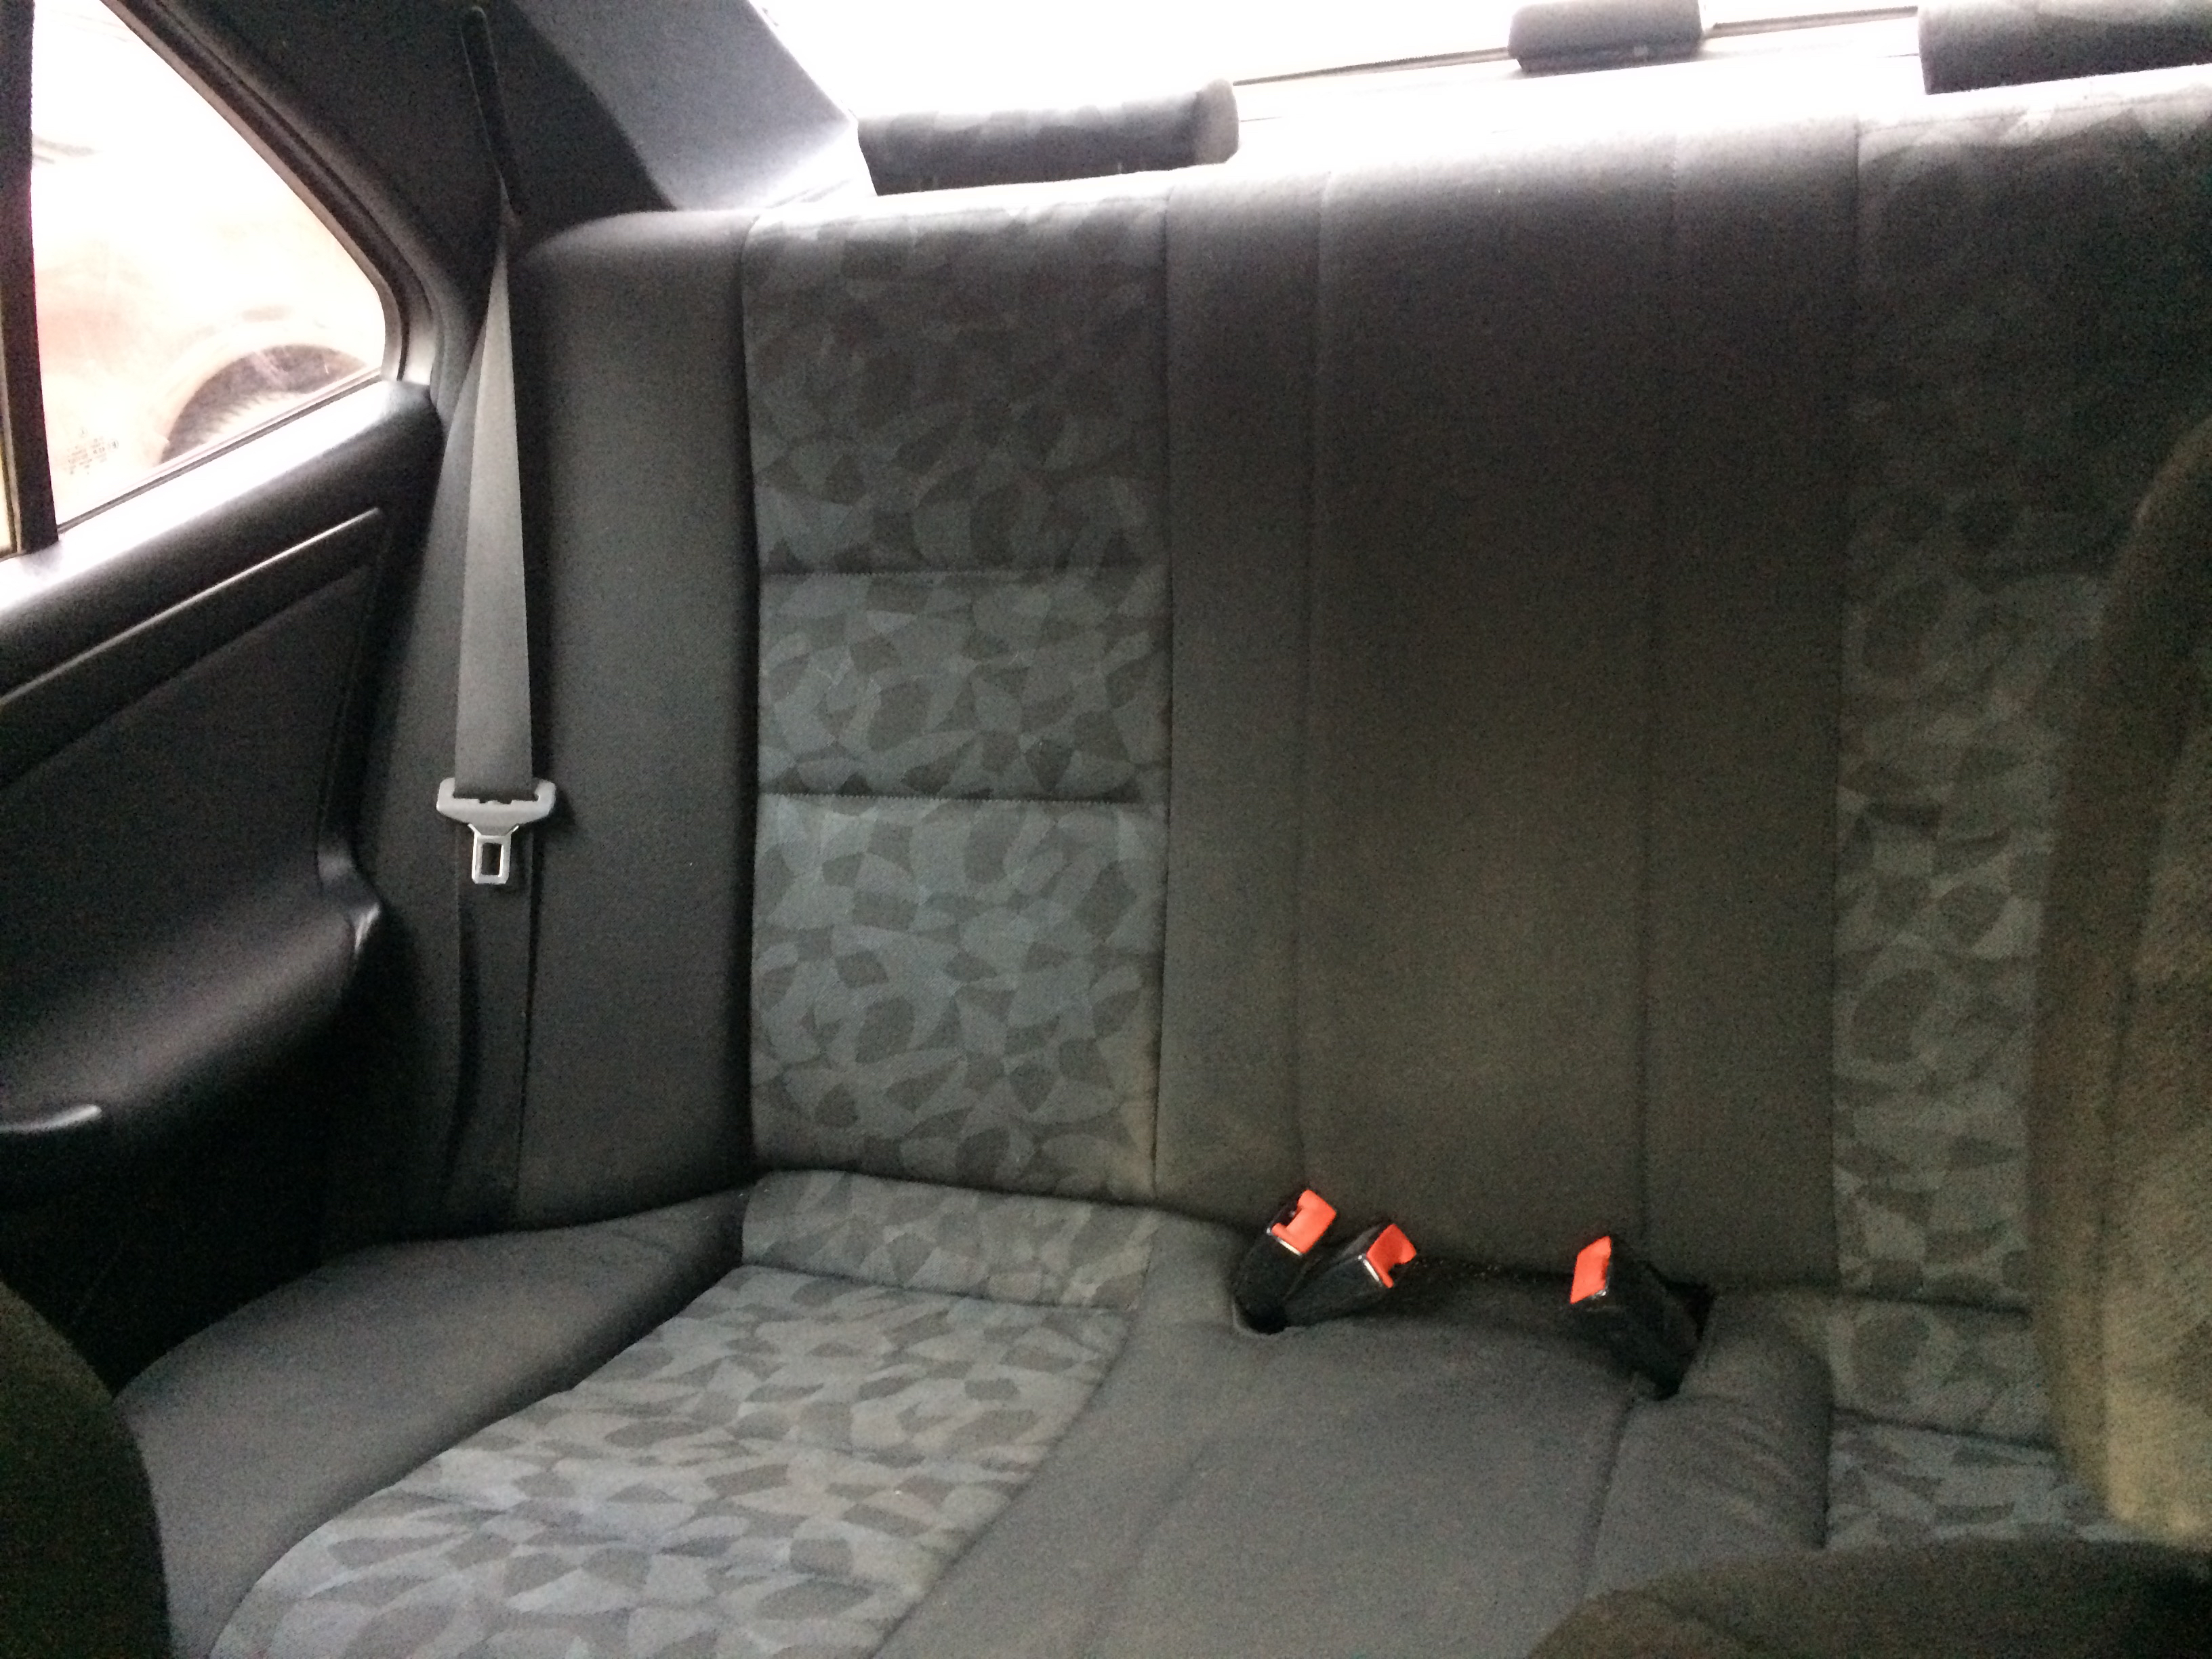 Фото 2 - Mercedes-Benz c180 w202 стоит ГБО 4 поколения! ГАЗ Пропан-бутан